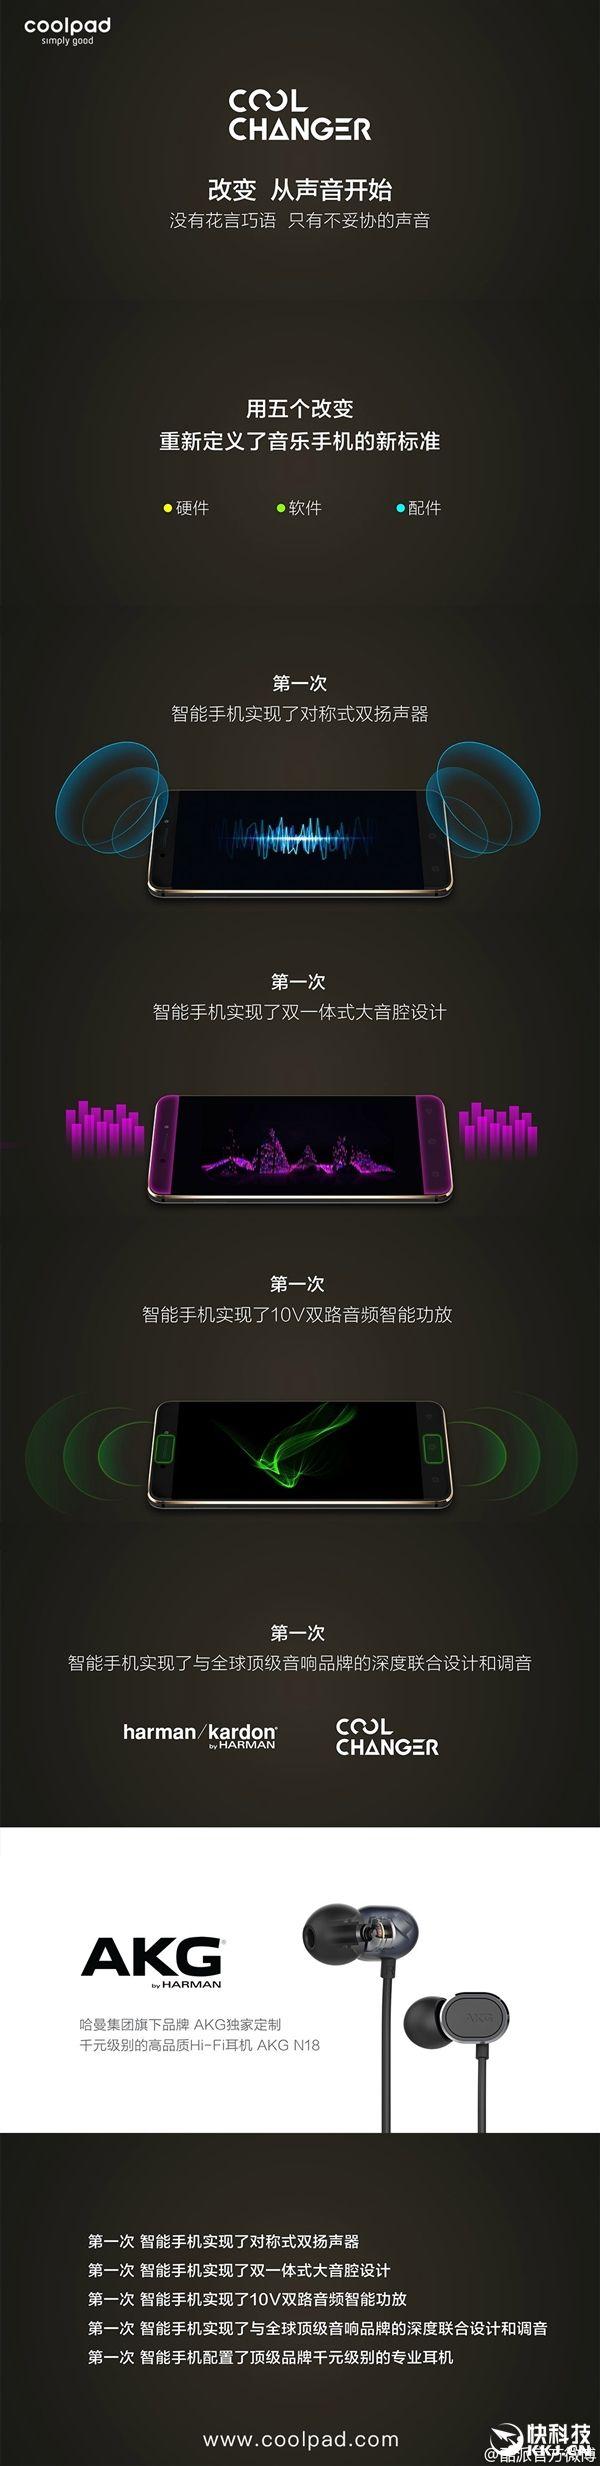 Cool Changer S1: представлен мощный флагман для аудиофилов – фото 2